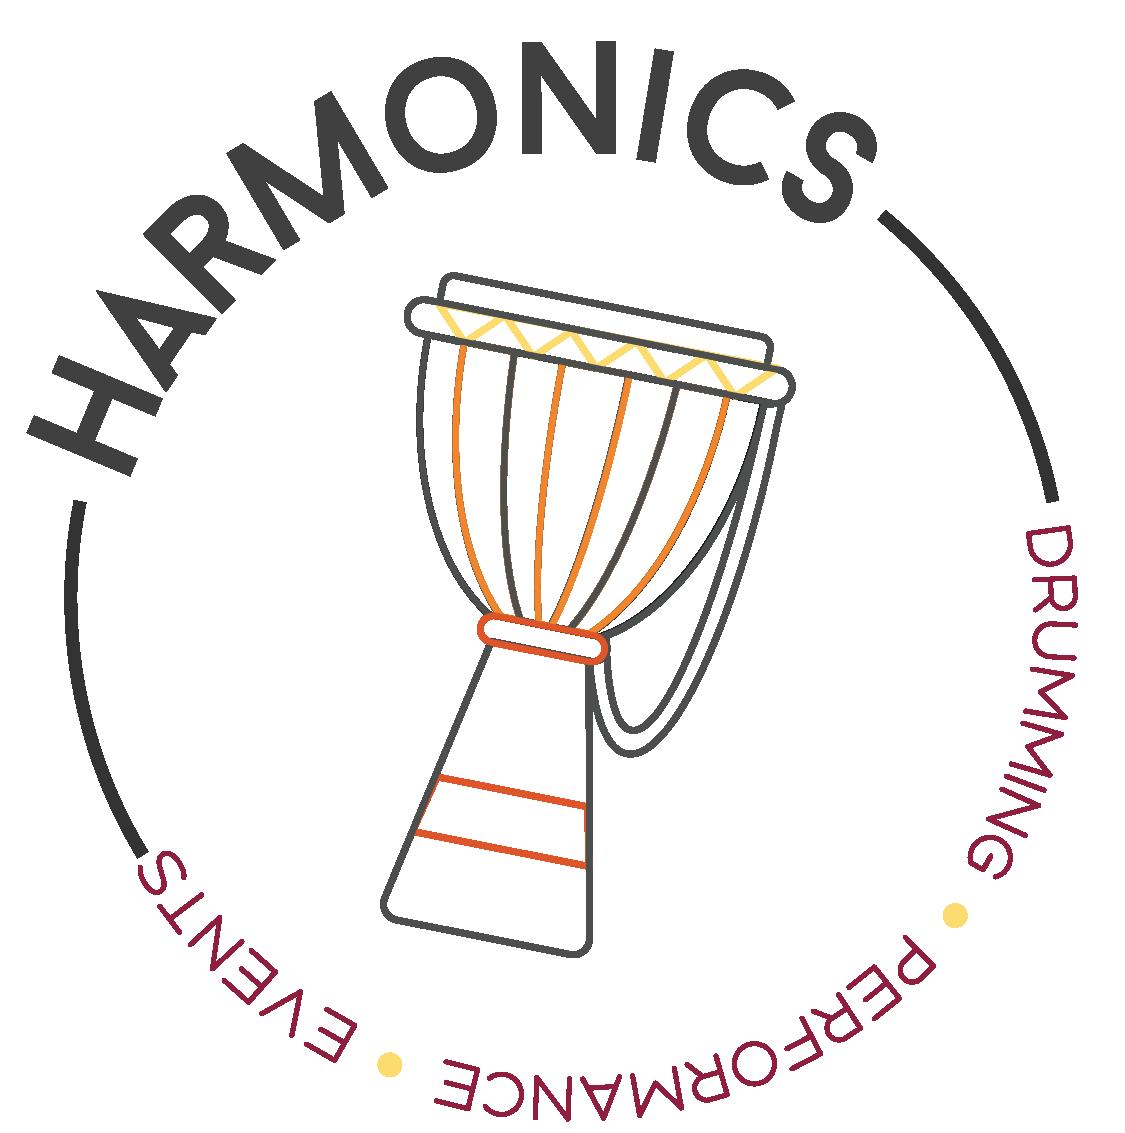 harmonics-sub-logo-alessia-pinna